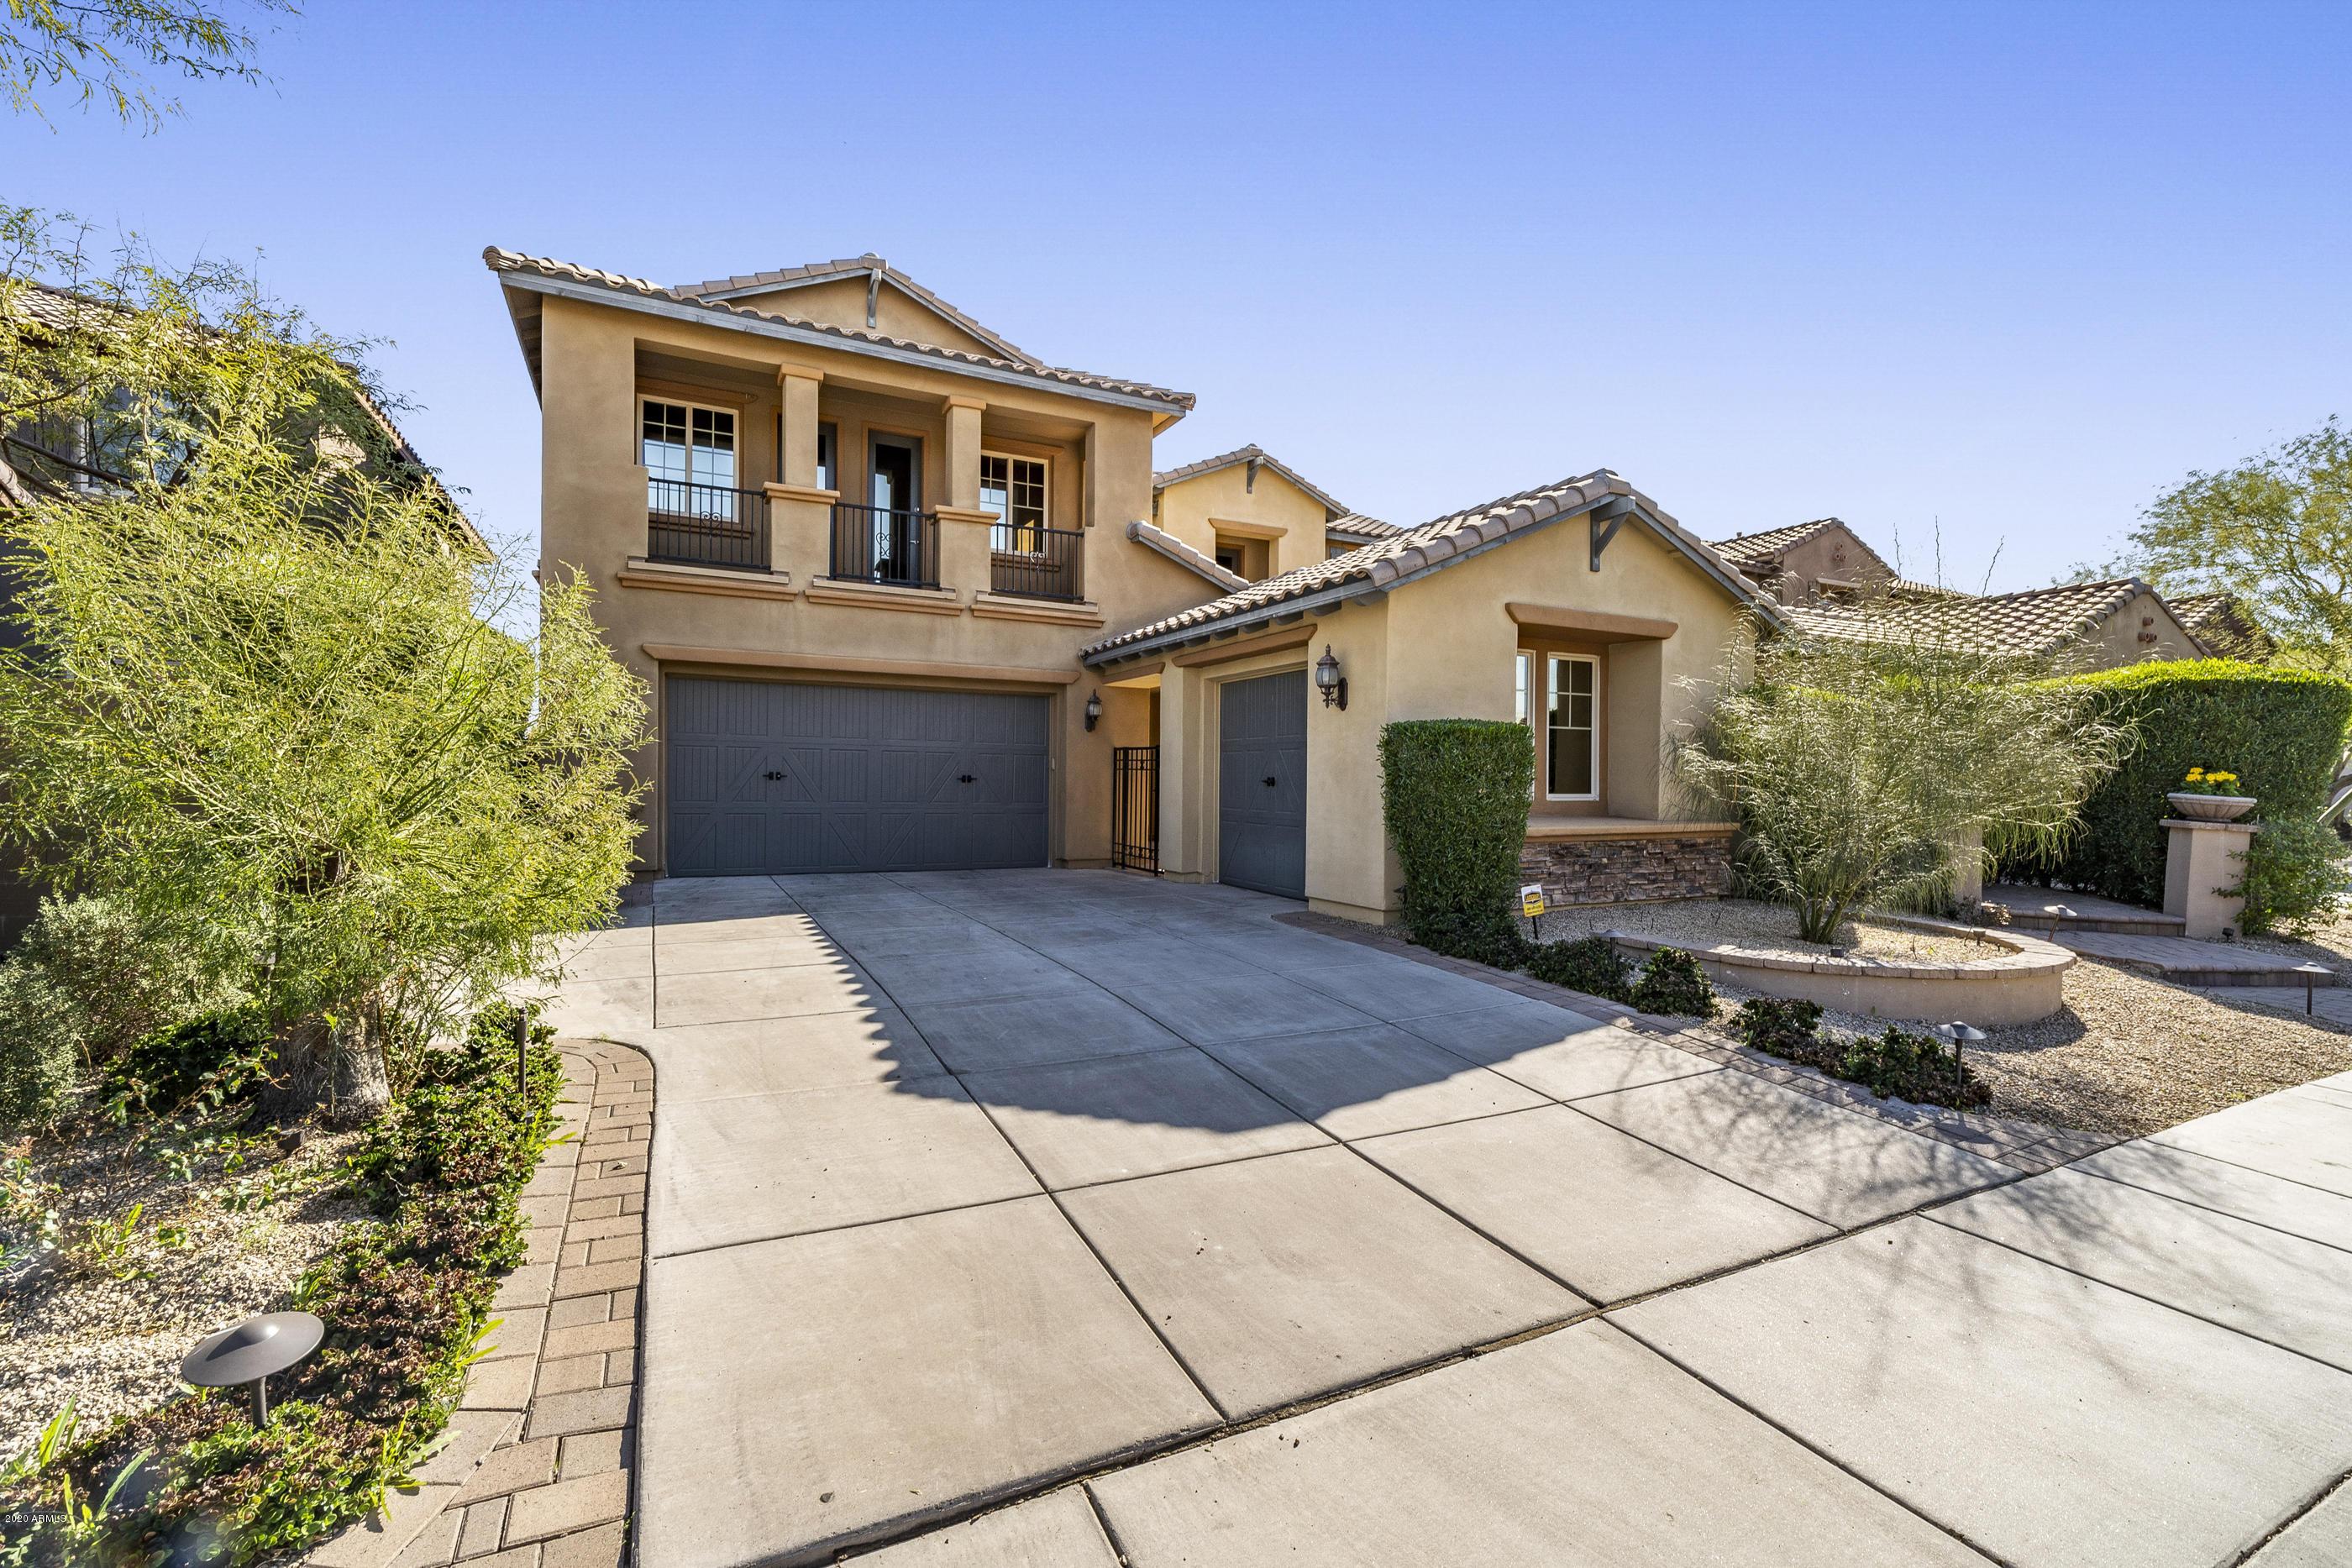 Photo of 3741 E EMBER GLOW Way, Phoenix, AZ 85050